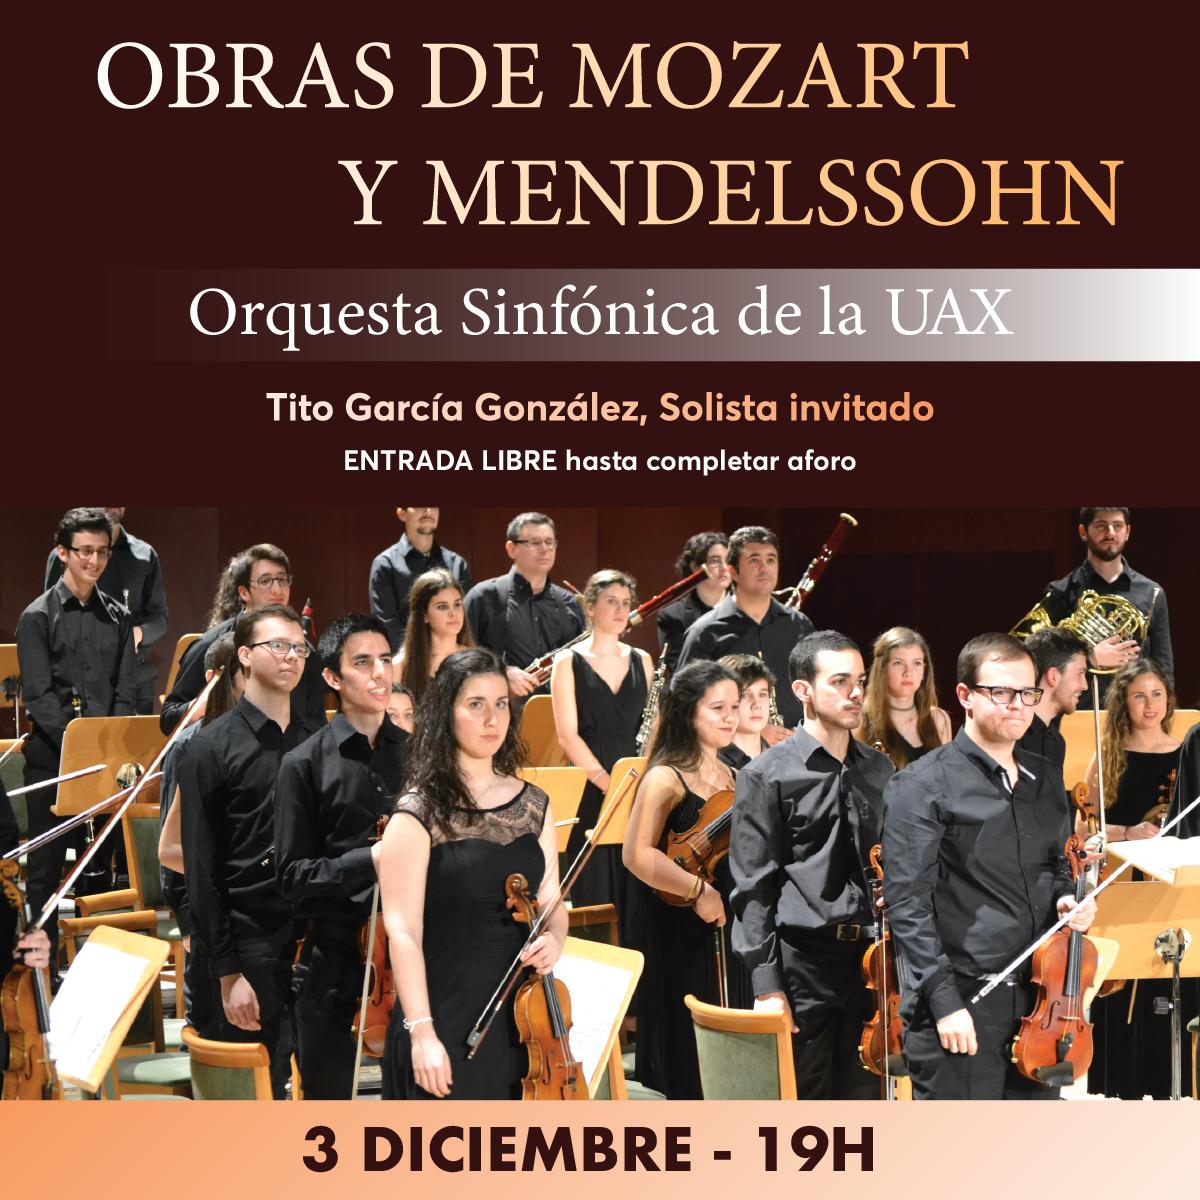 OBRAS DE MOZART Y MENDELSSOHN